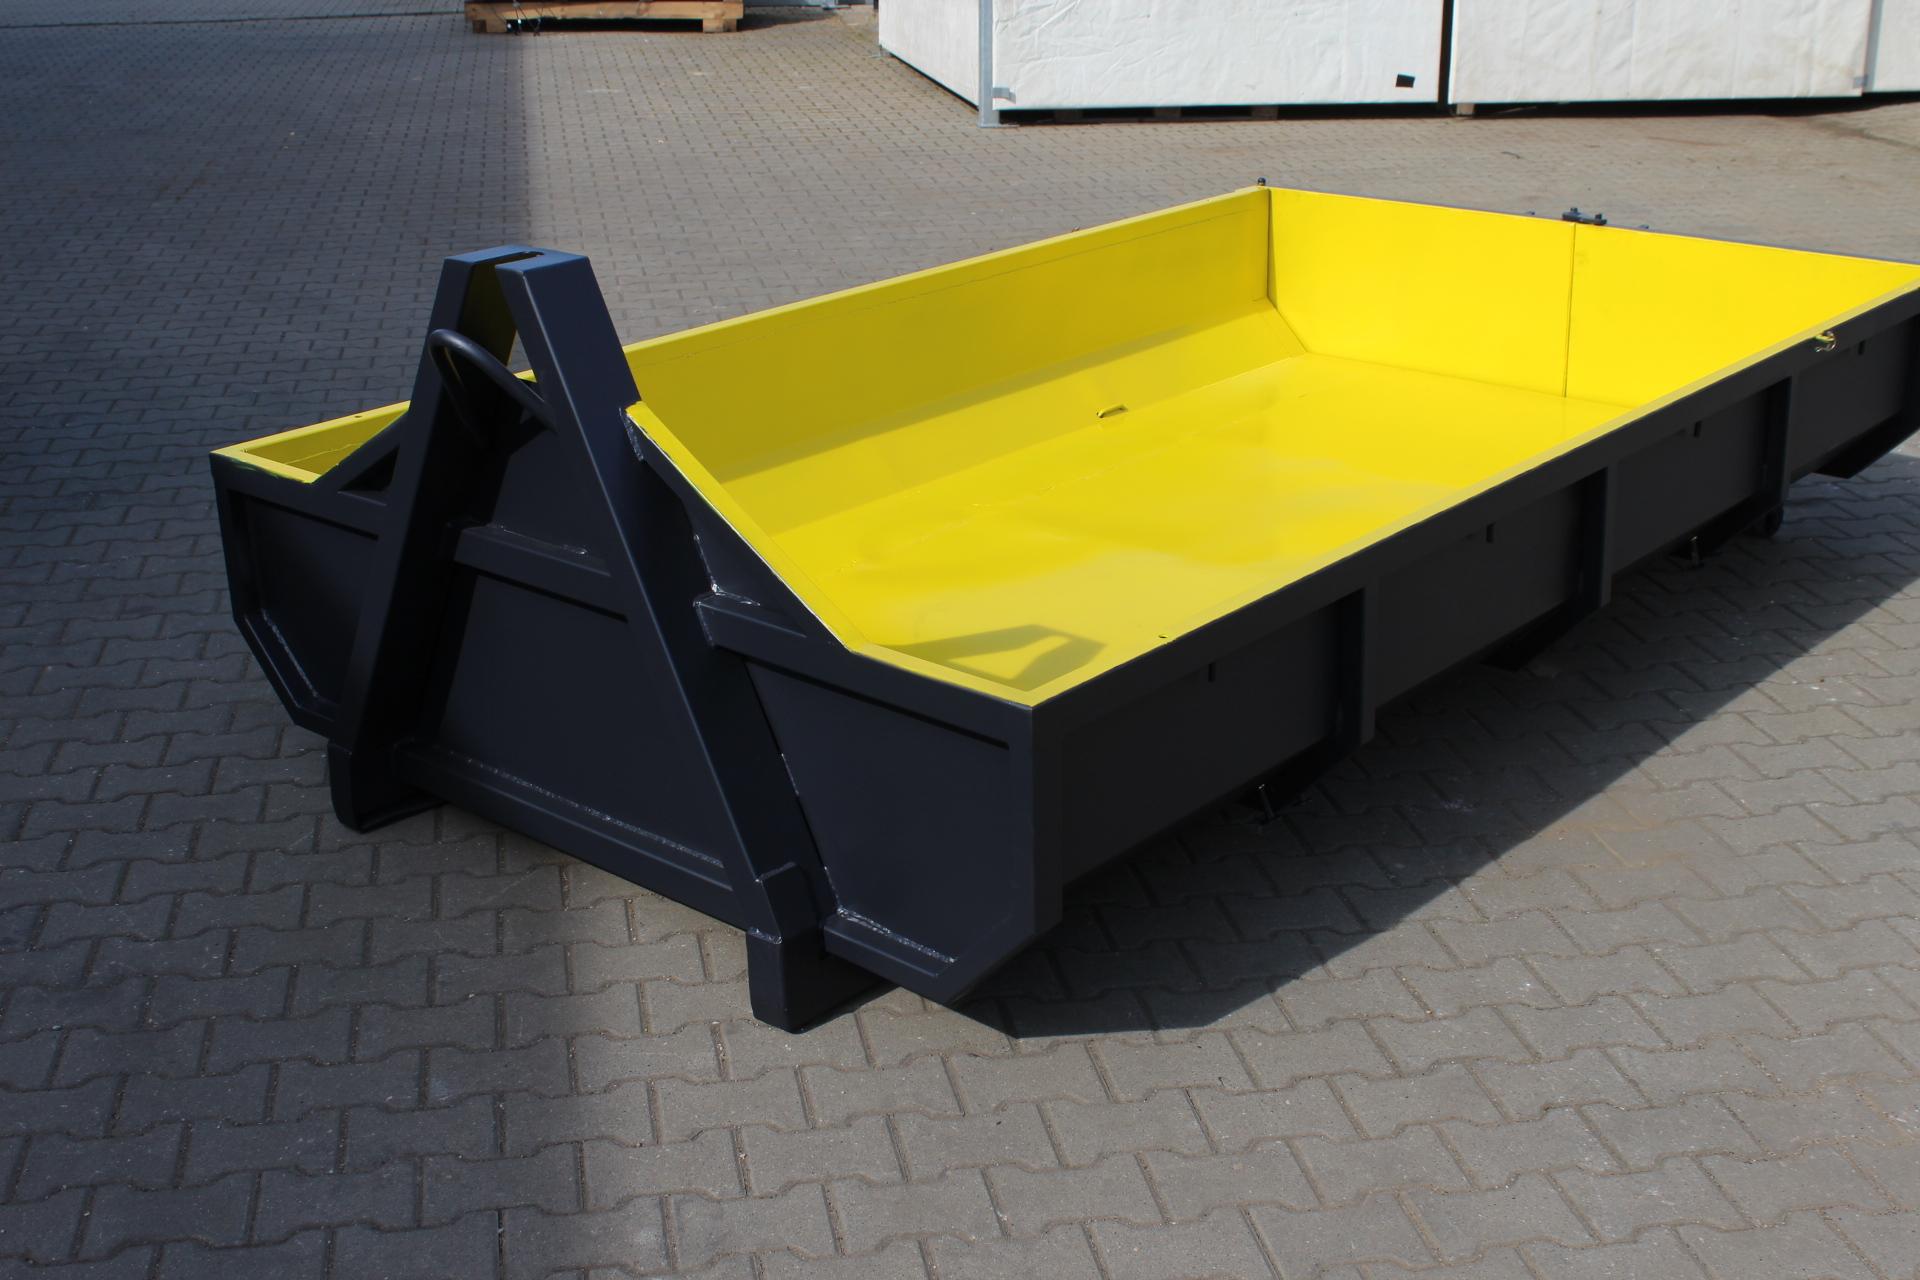 Abrollcontainer Hornet 2,5 cbm nach DIN 30720